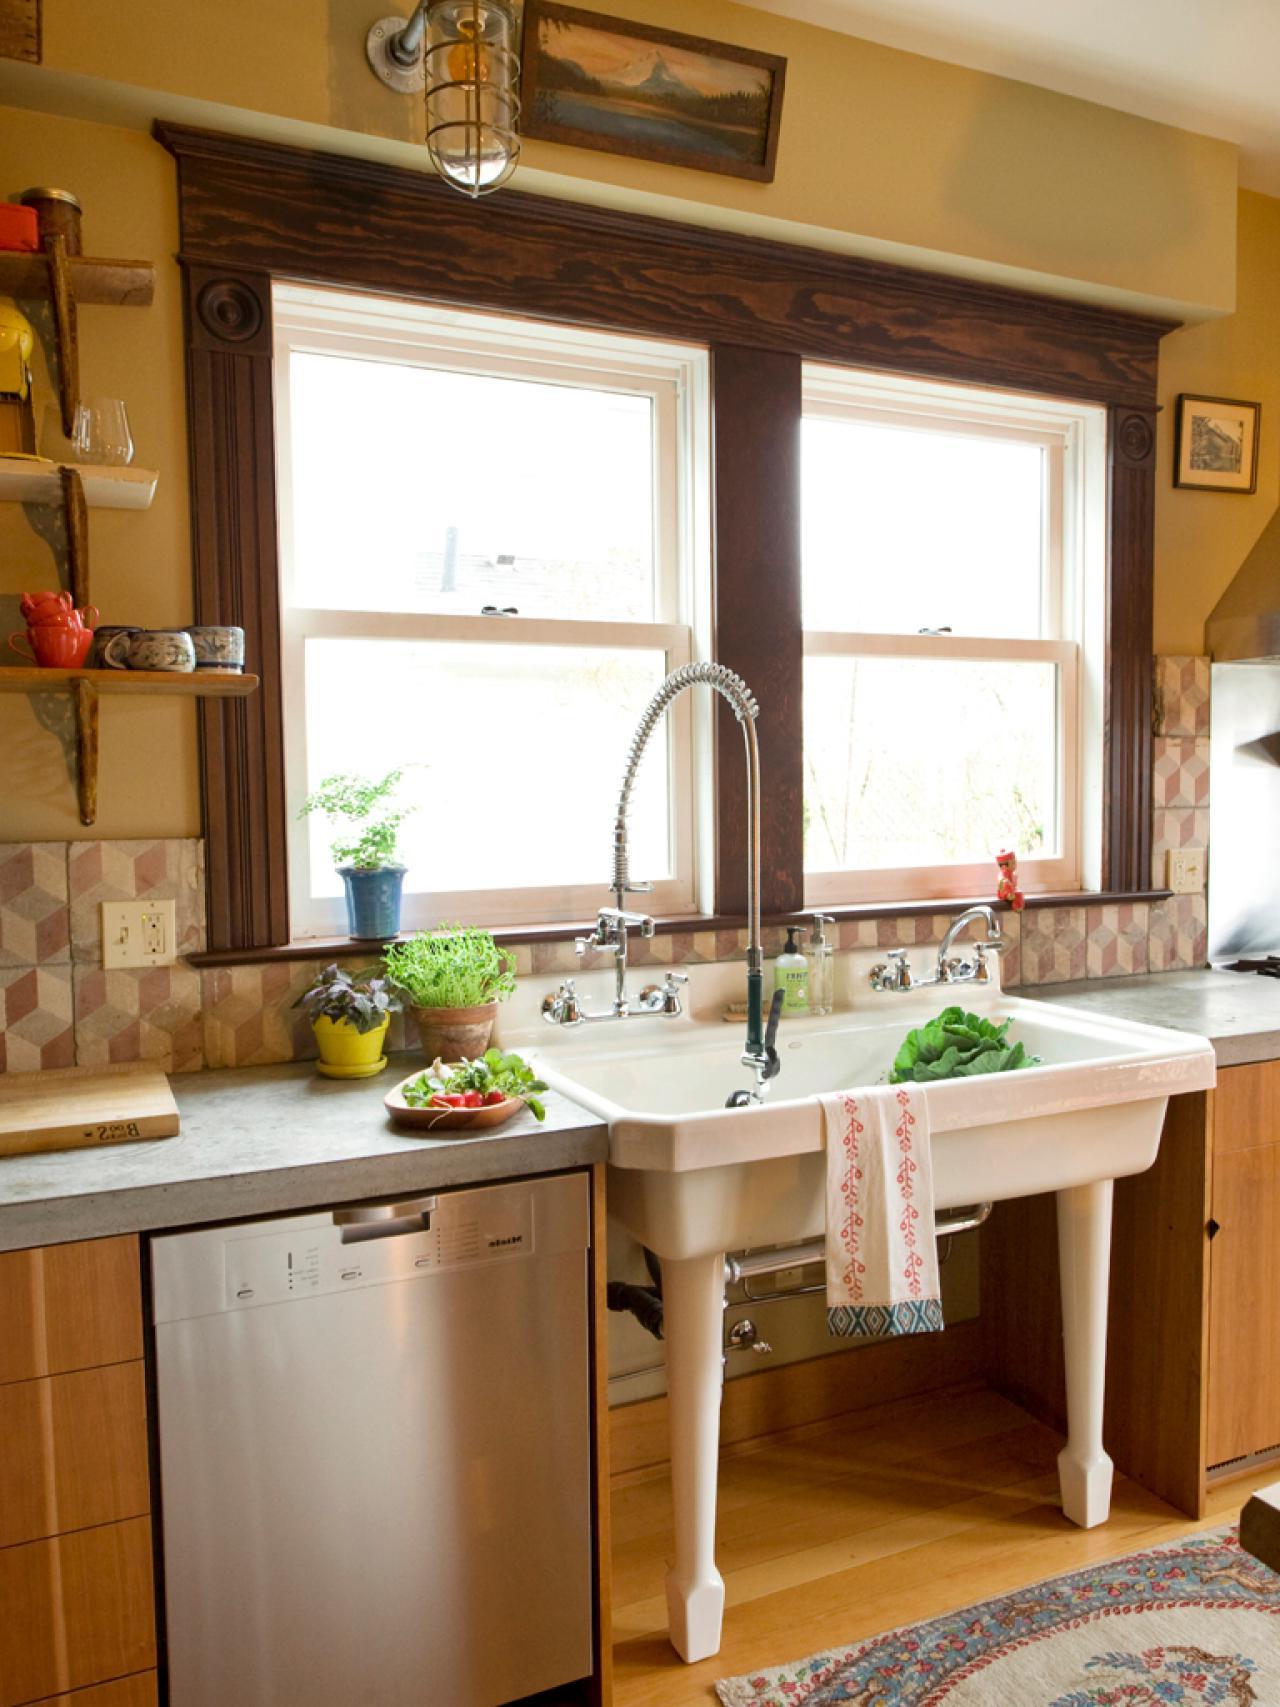 kitchen design ideas for older homes photo - 3